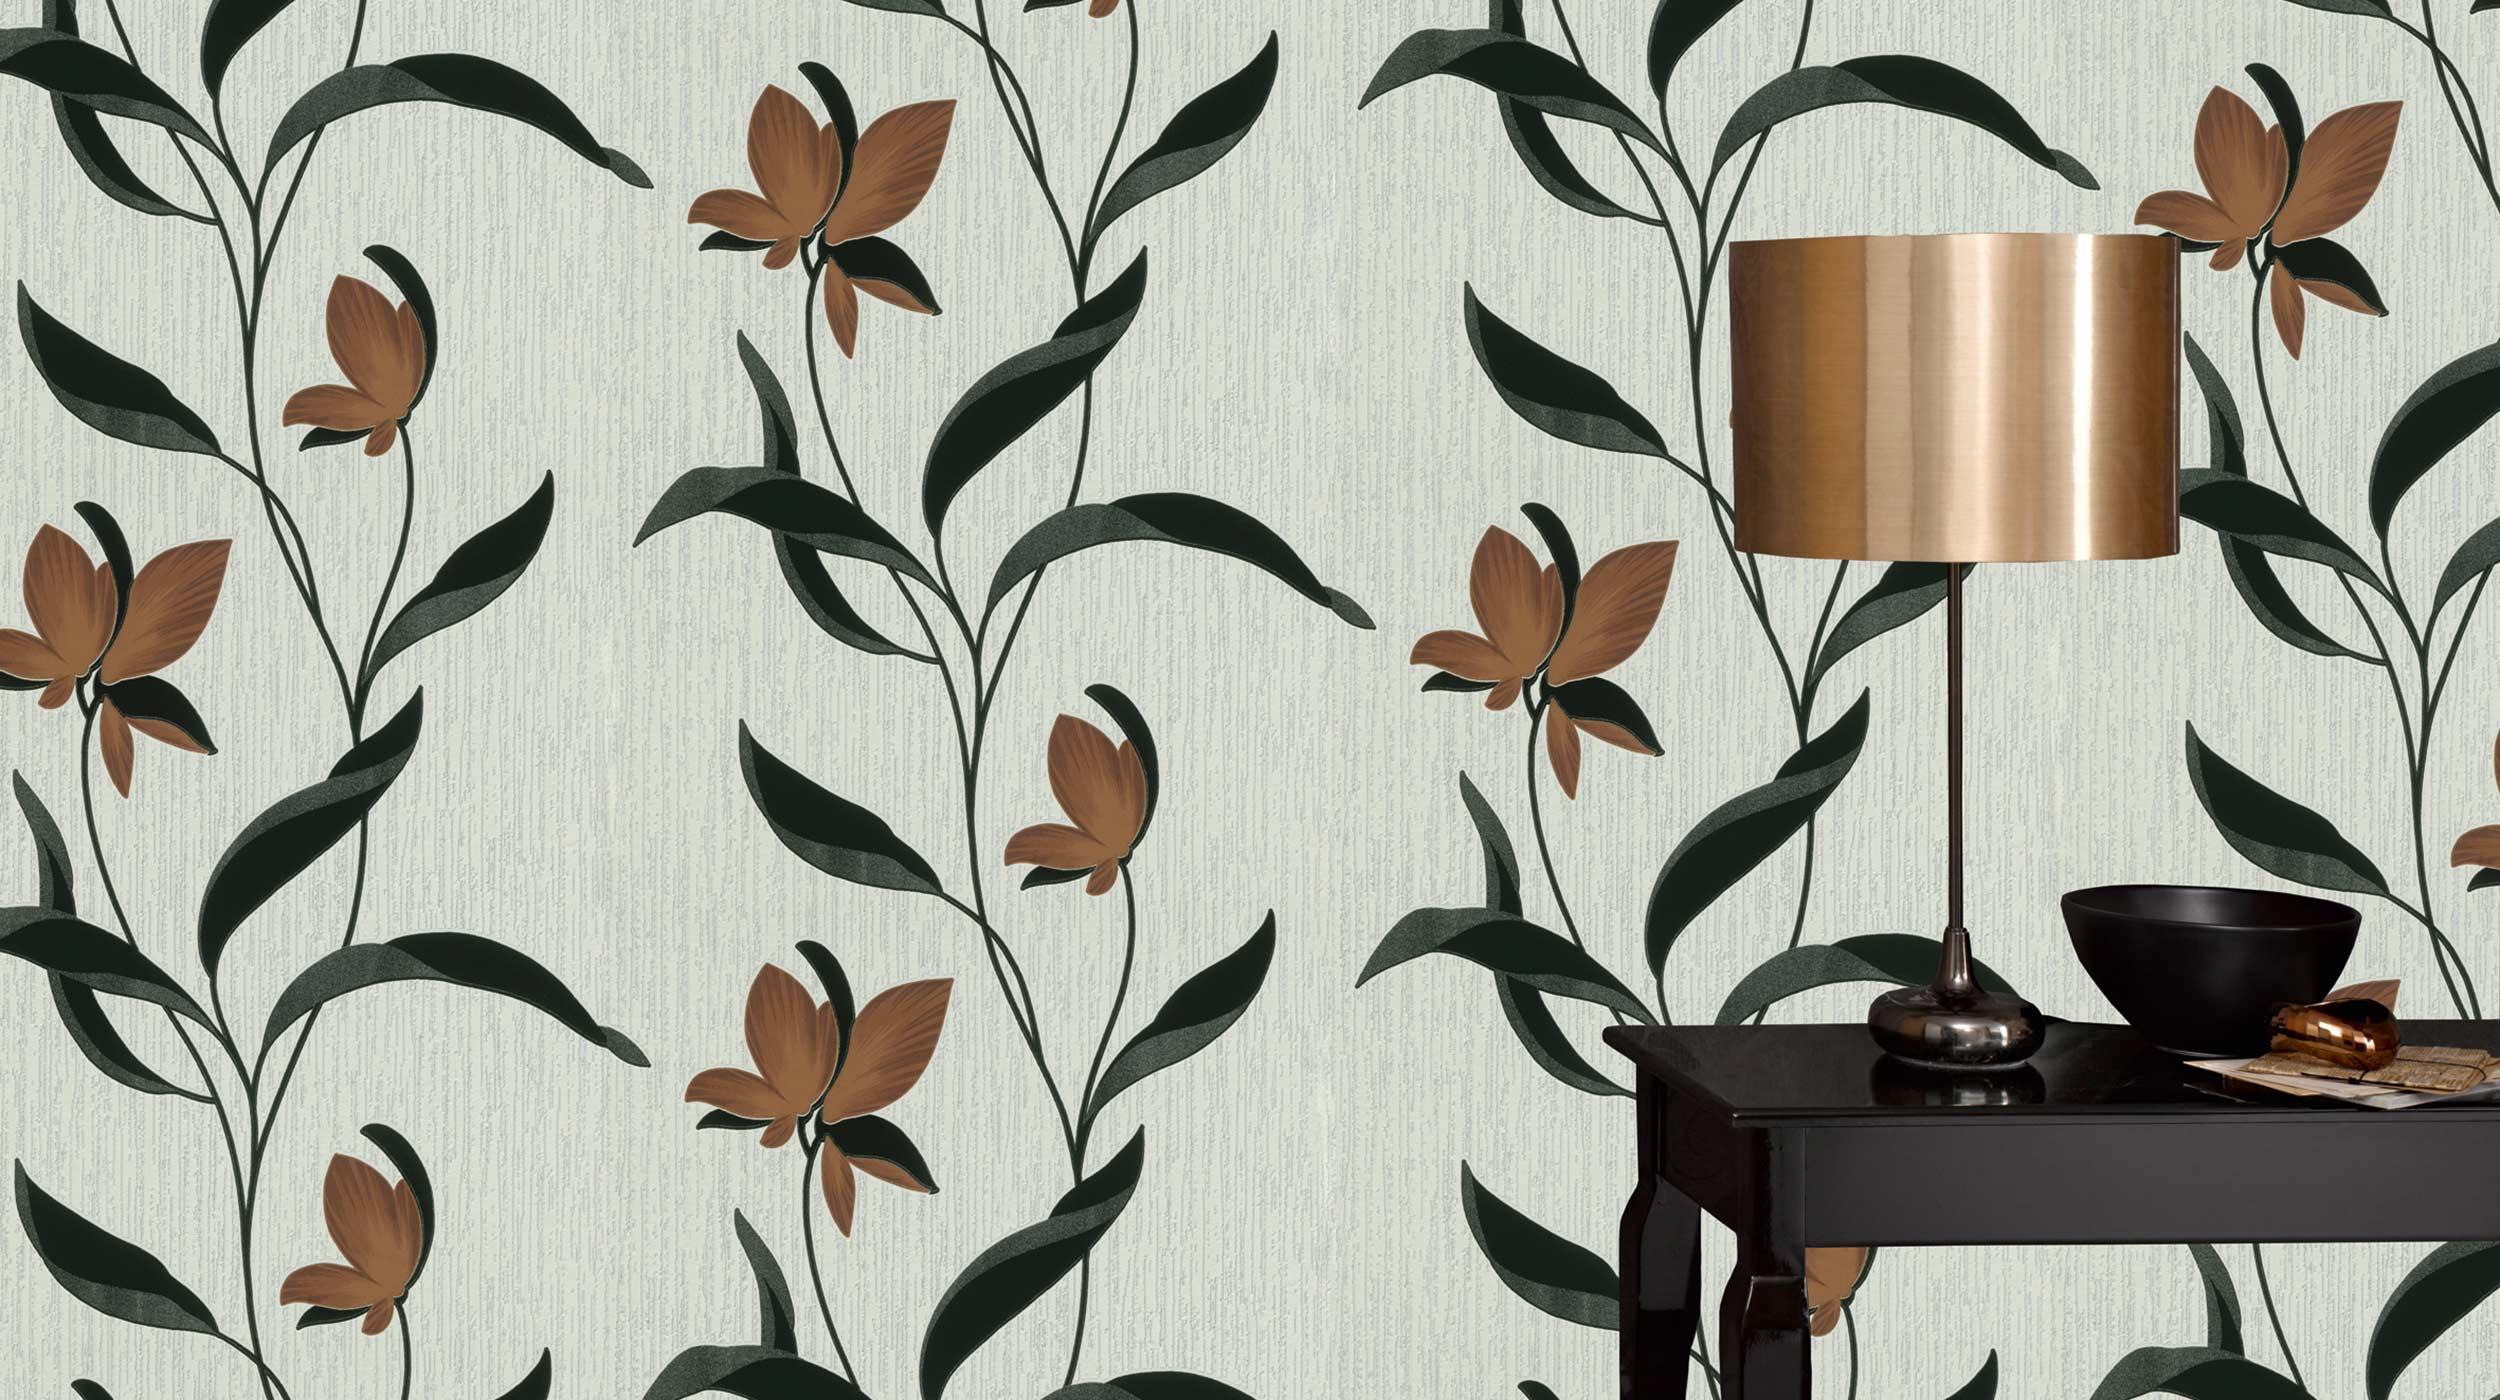 tapete fleur online erismann cie gmbh. Black Bedroom Furniture Sets. Home Design Ideas